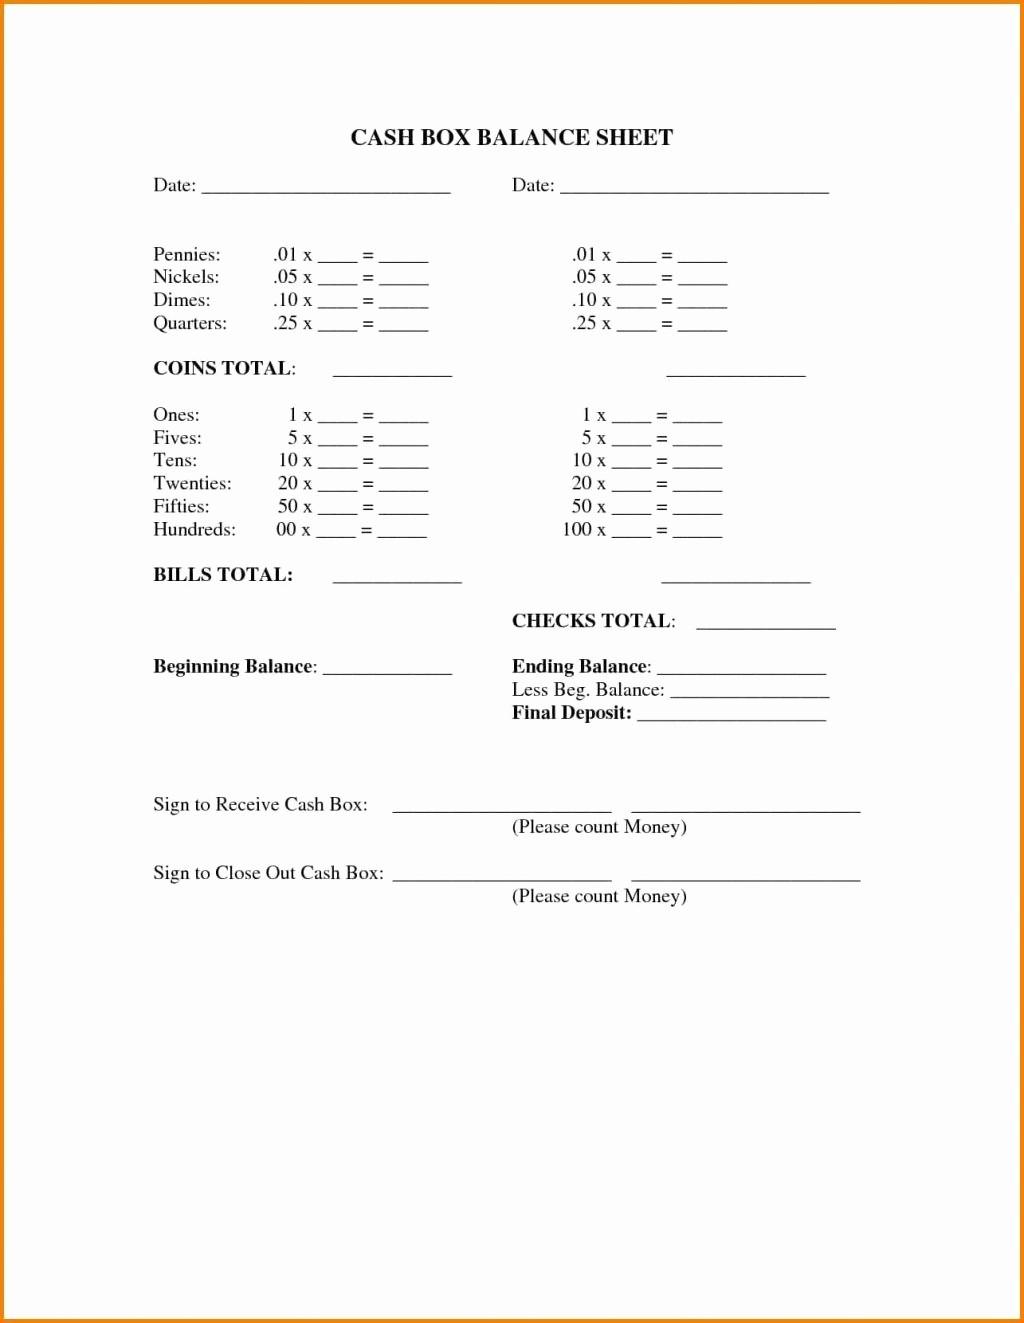 Cash Drawer Balance Sheet Template Luxury Sheet Cash Drawer Tally Template Till Google Search